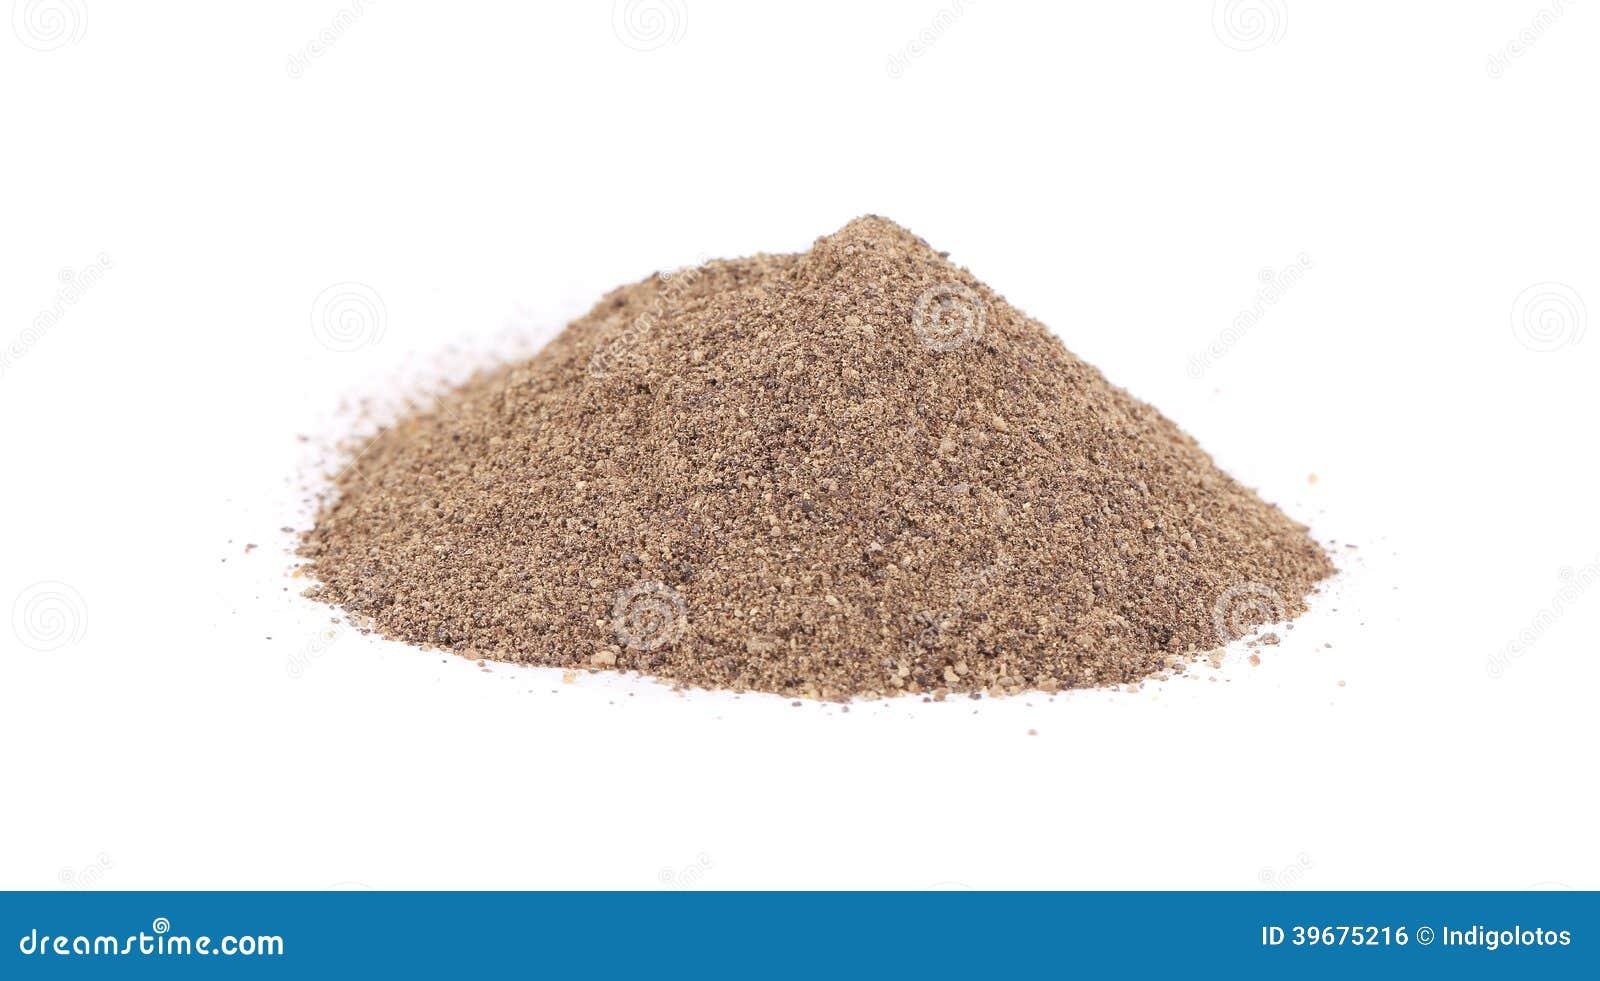 Pilea pile of ground pepper